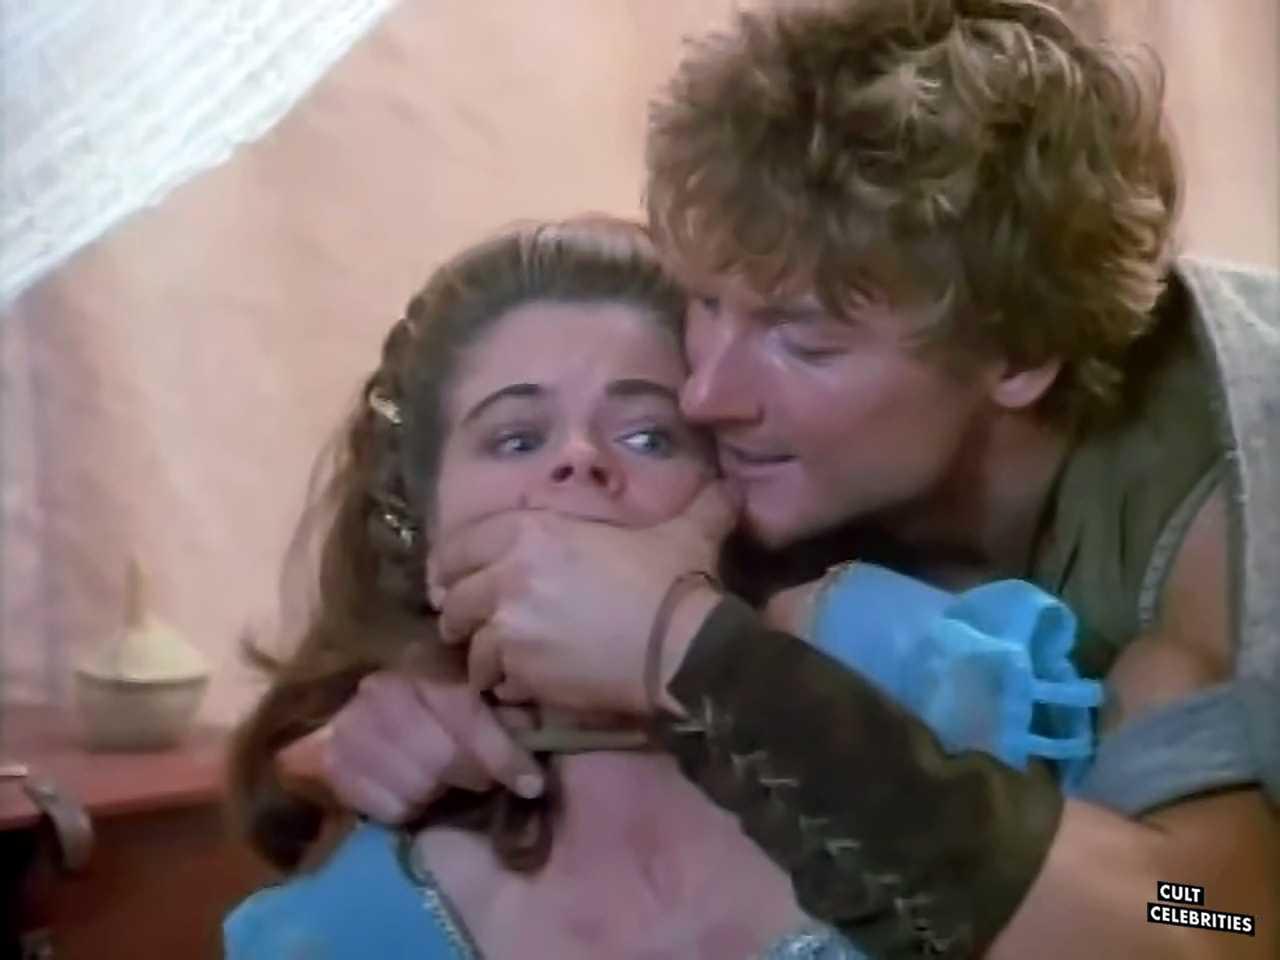 John Allen Nelson and Carla Herd in Deathstalker and the Warrior